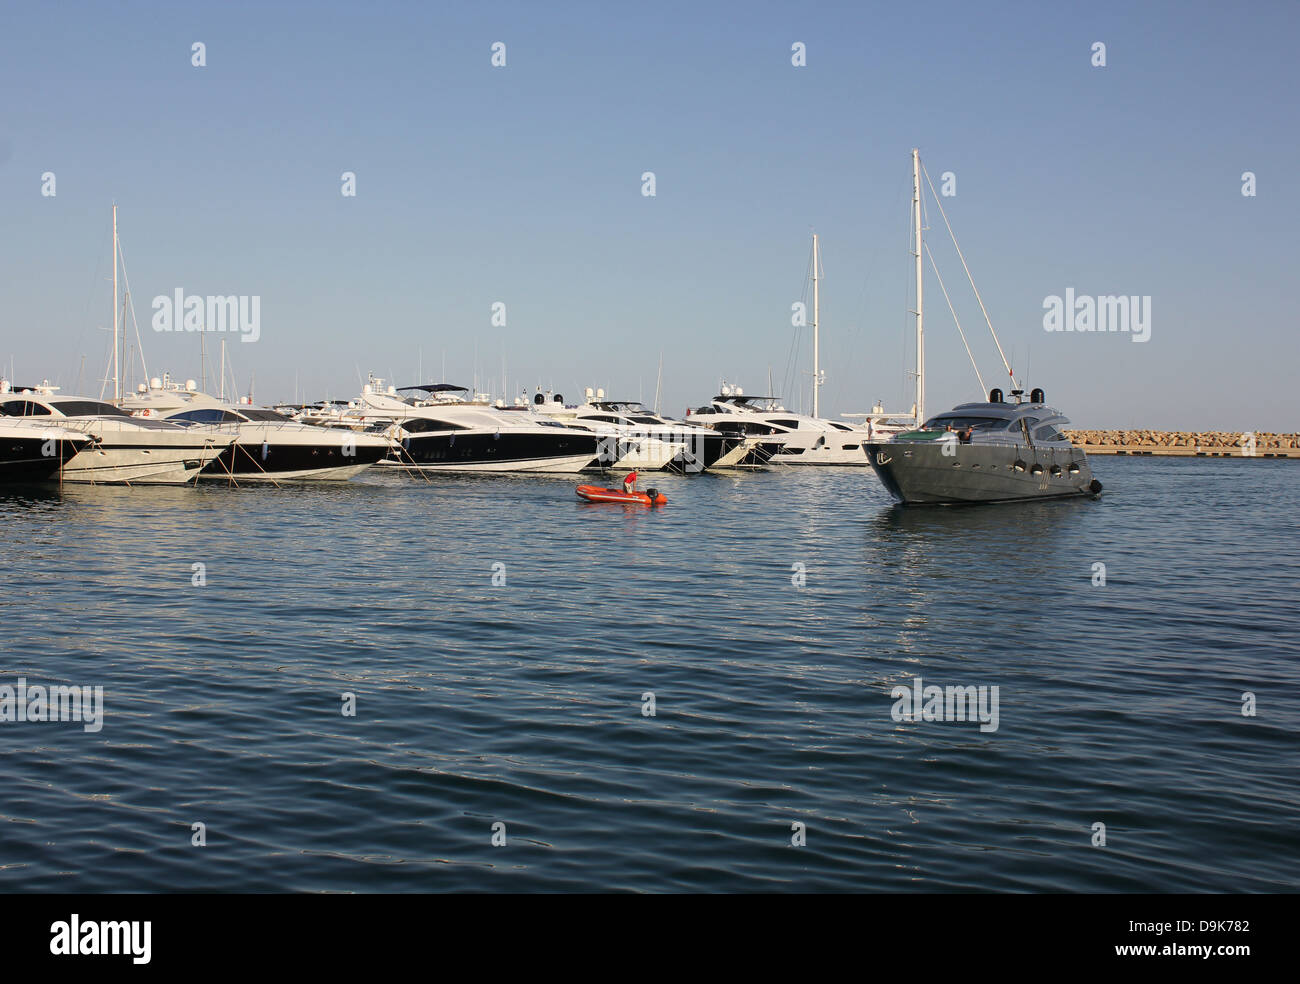 Luxury motor superyacht returning to berth - with marina berthing RIB in attendance - in Puerto Portals marina, - Stock Image